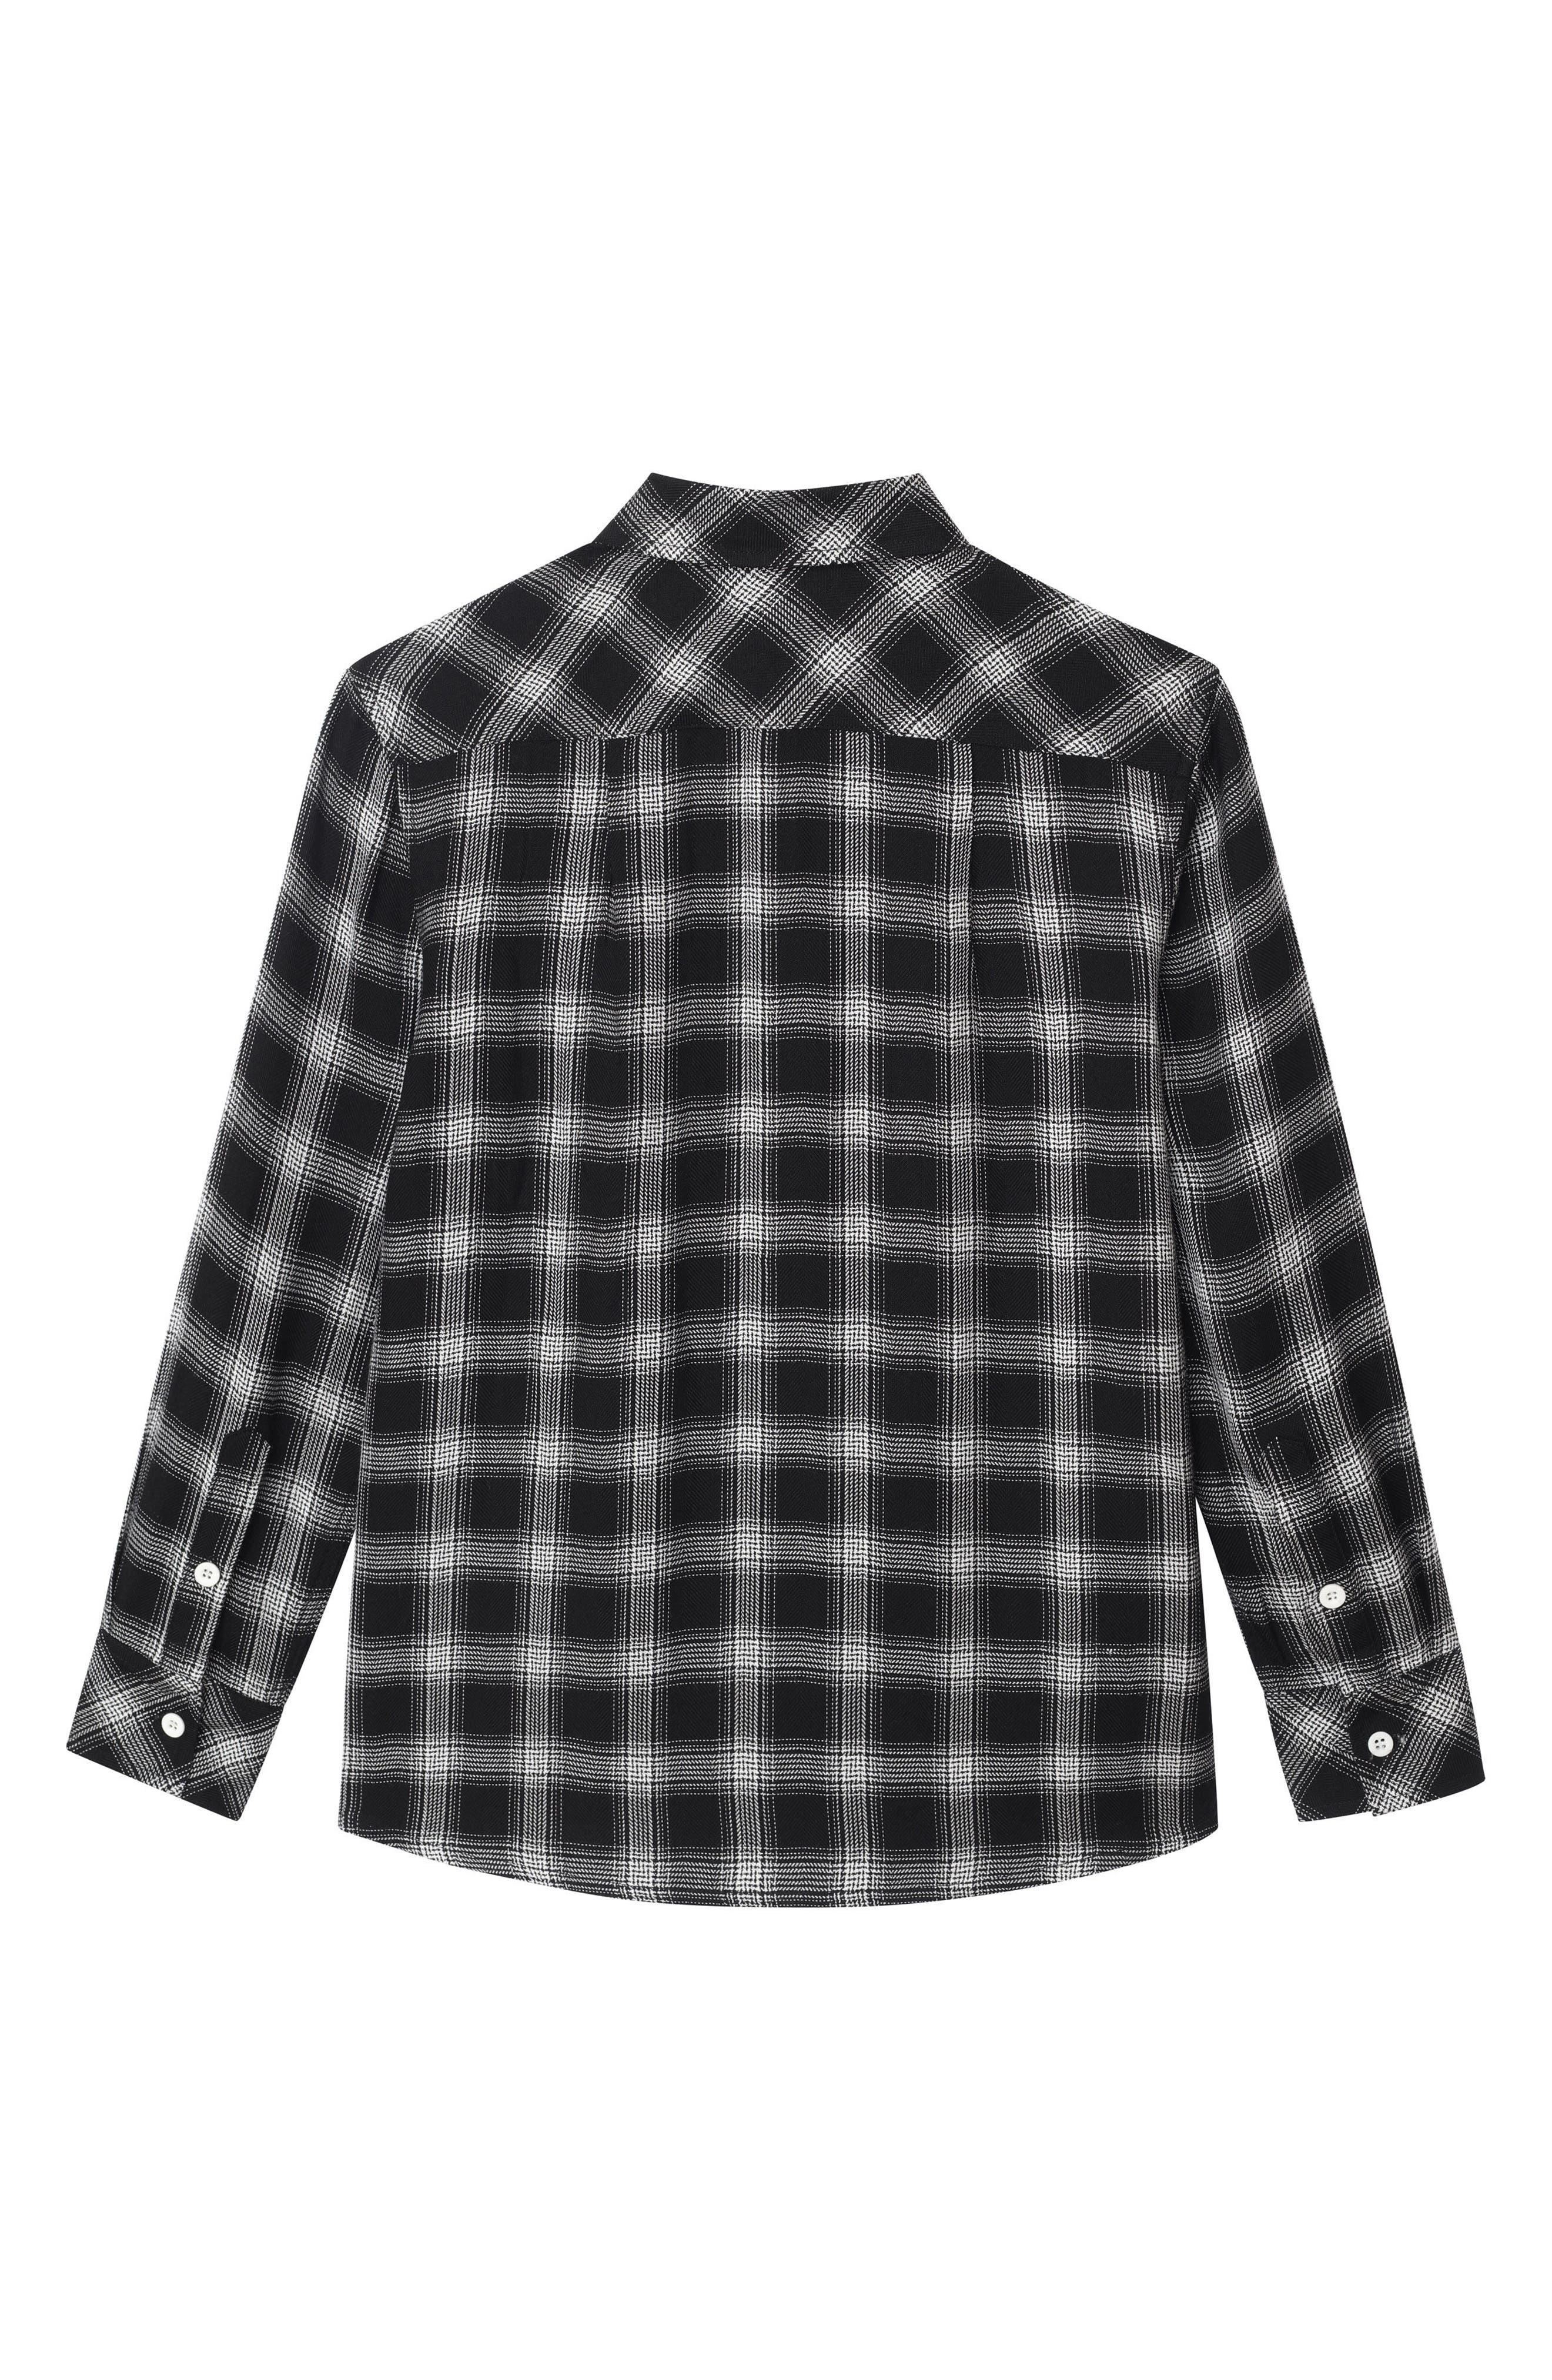 Ash Plaid Woven Shirt,                         Main,                         color, BLACK PLAID